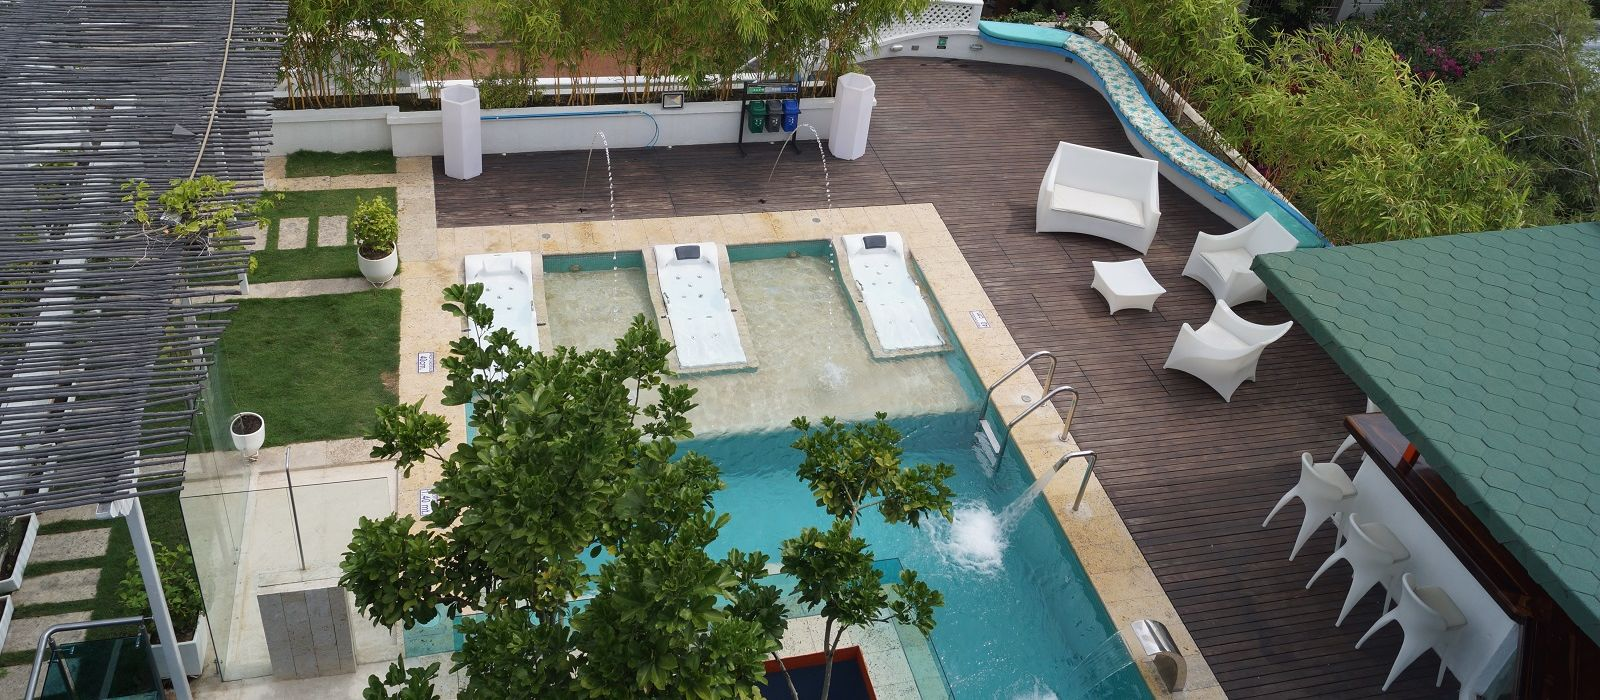 Hotel Placita Vieja Colombia